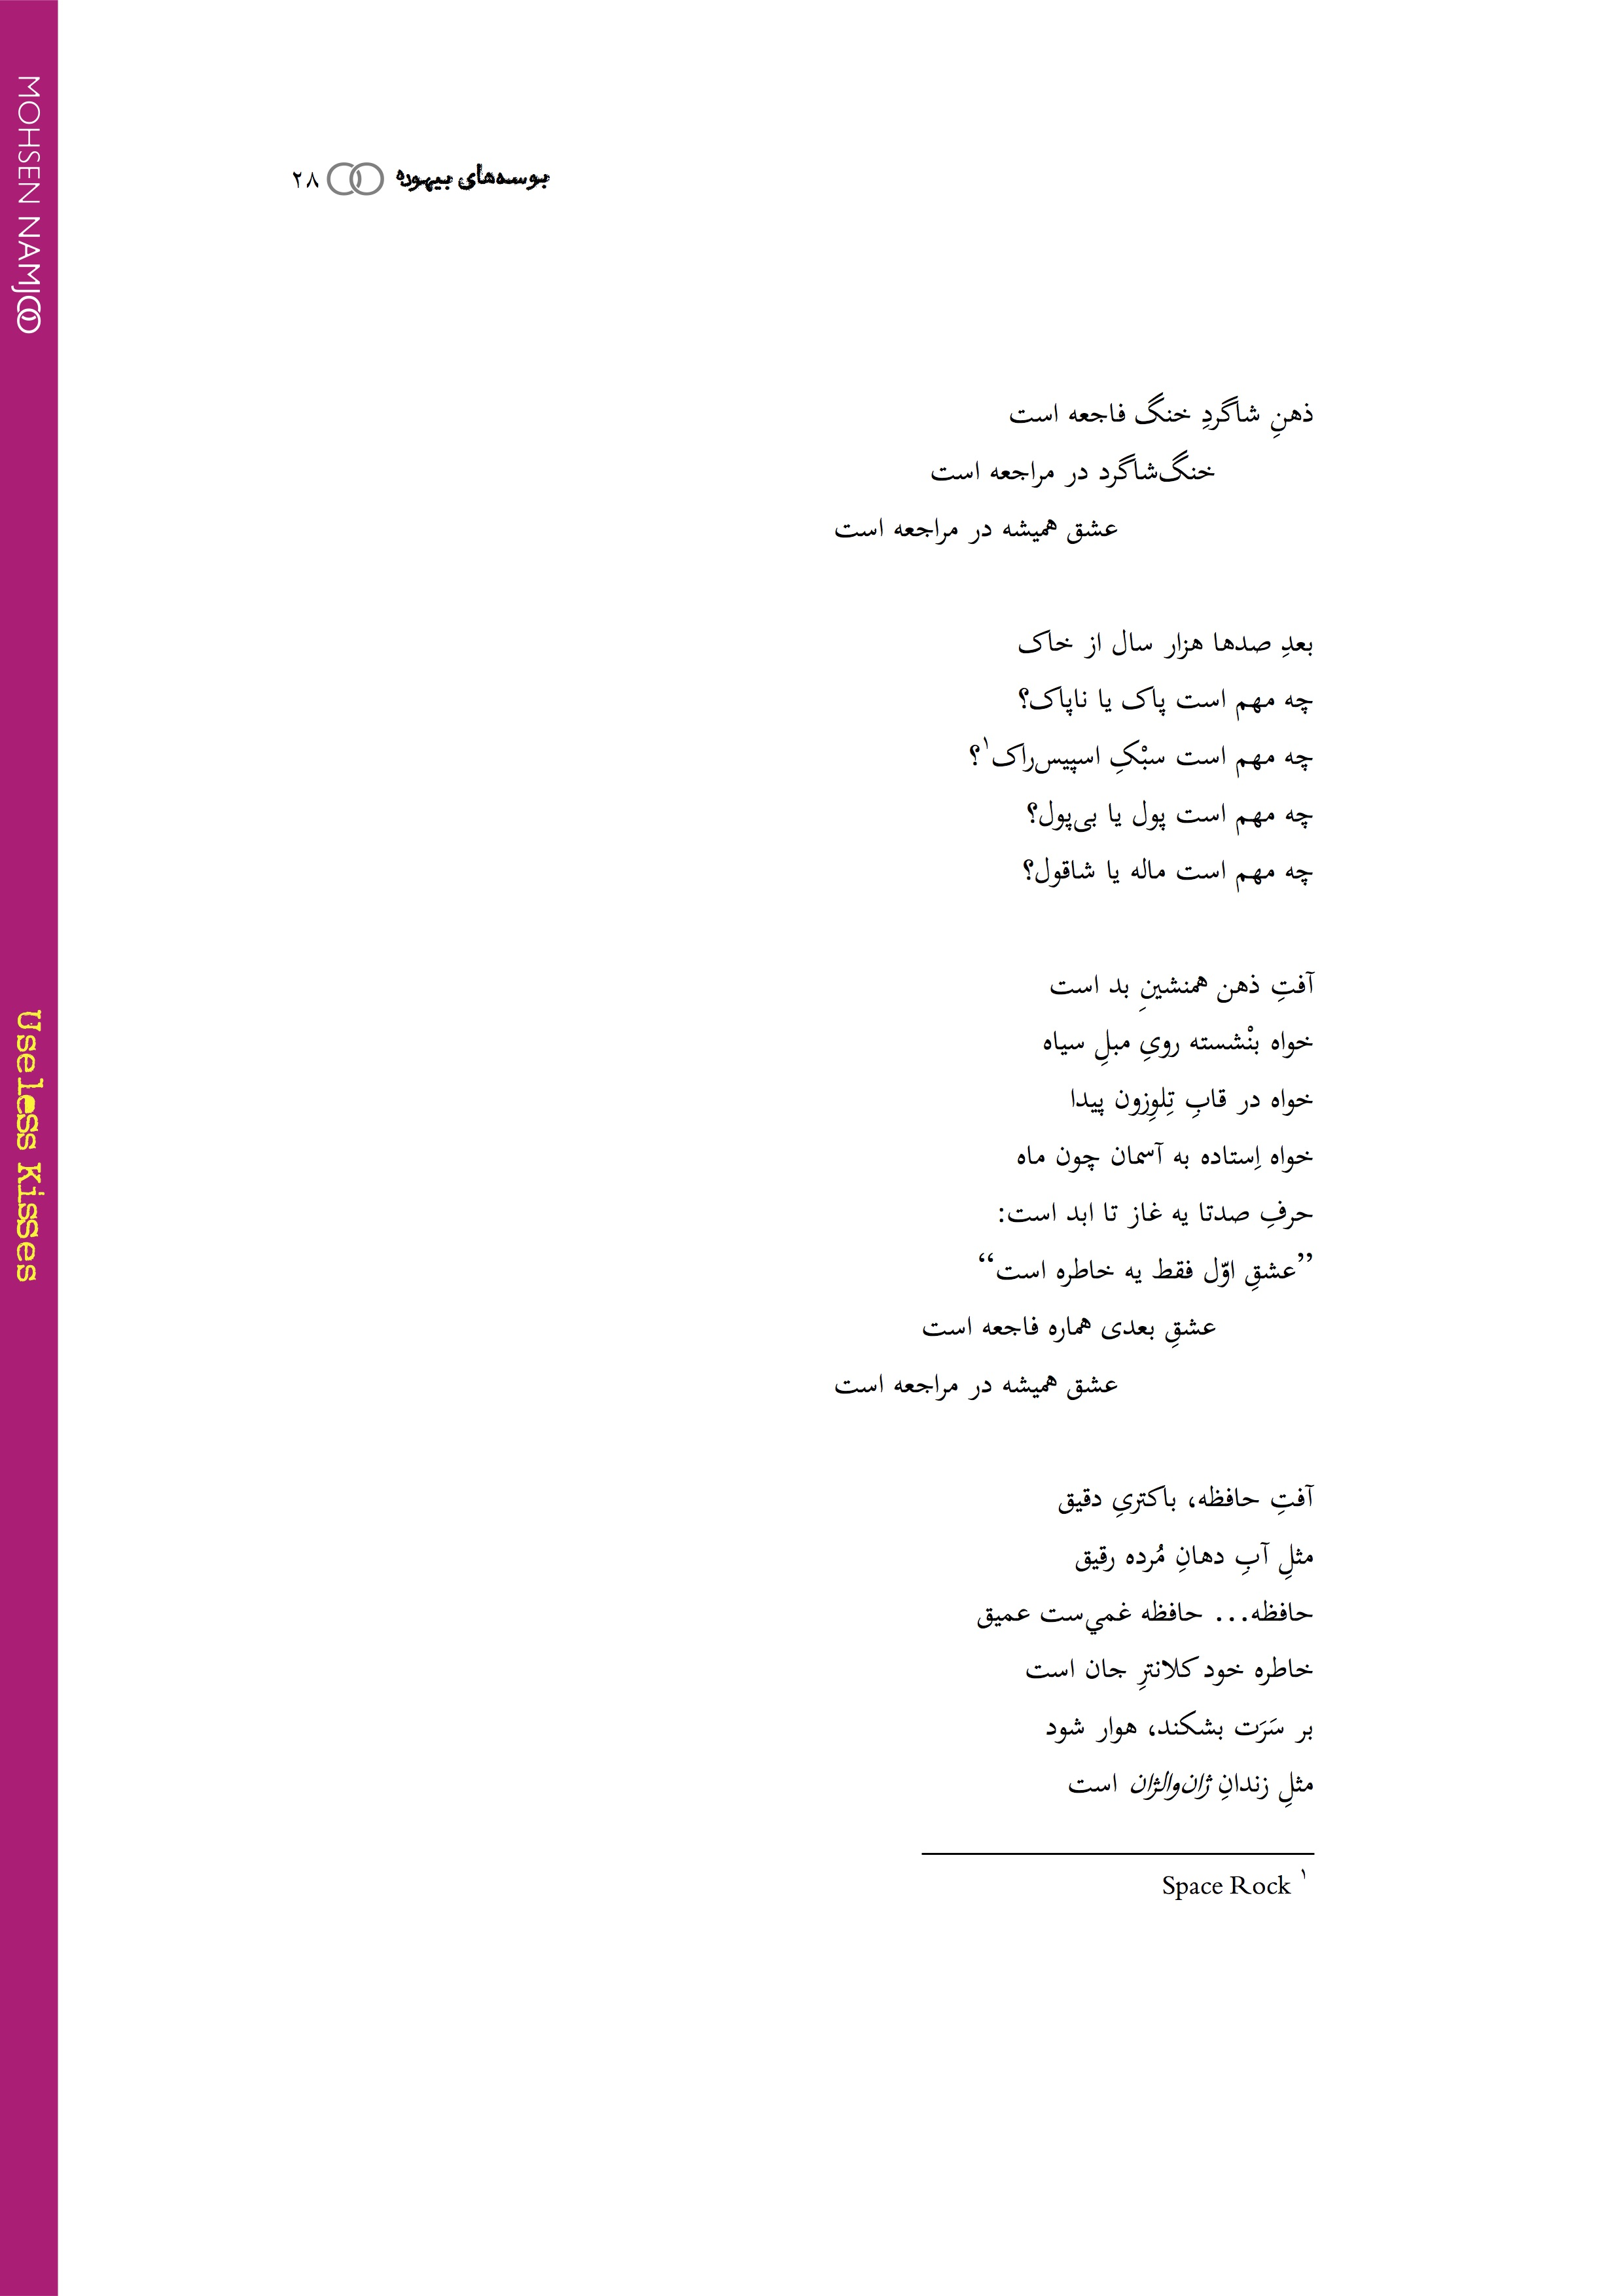 27Useless Kisses eBook (2nd Edition).jpg